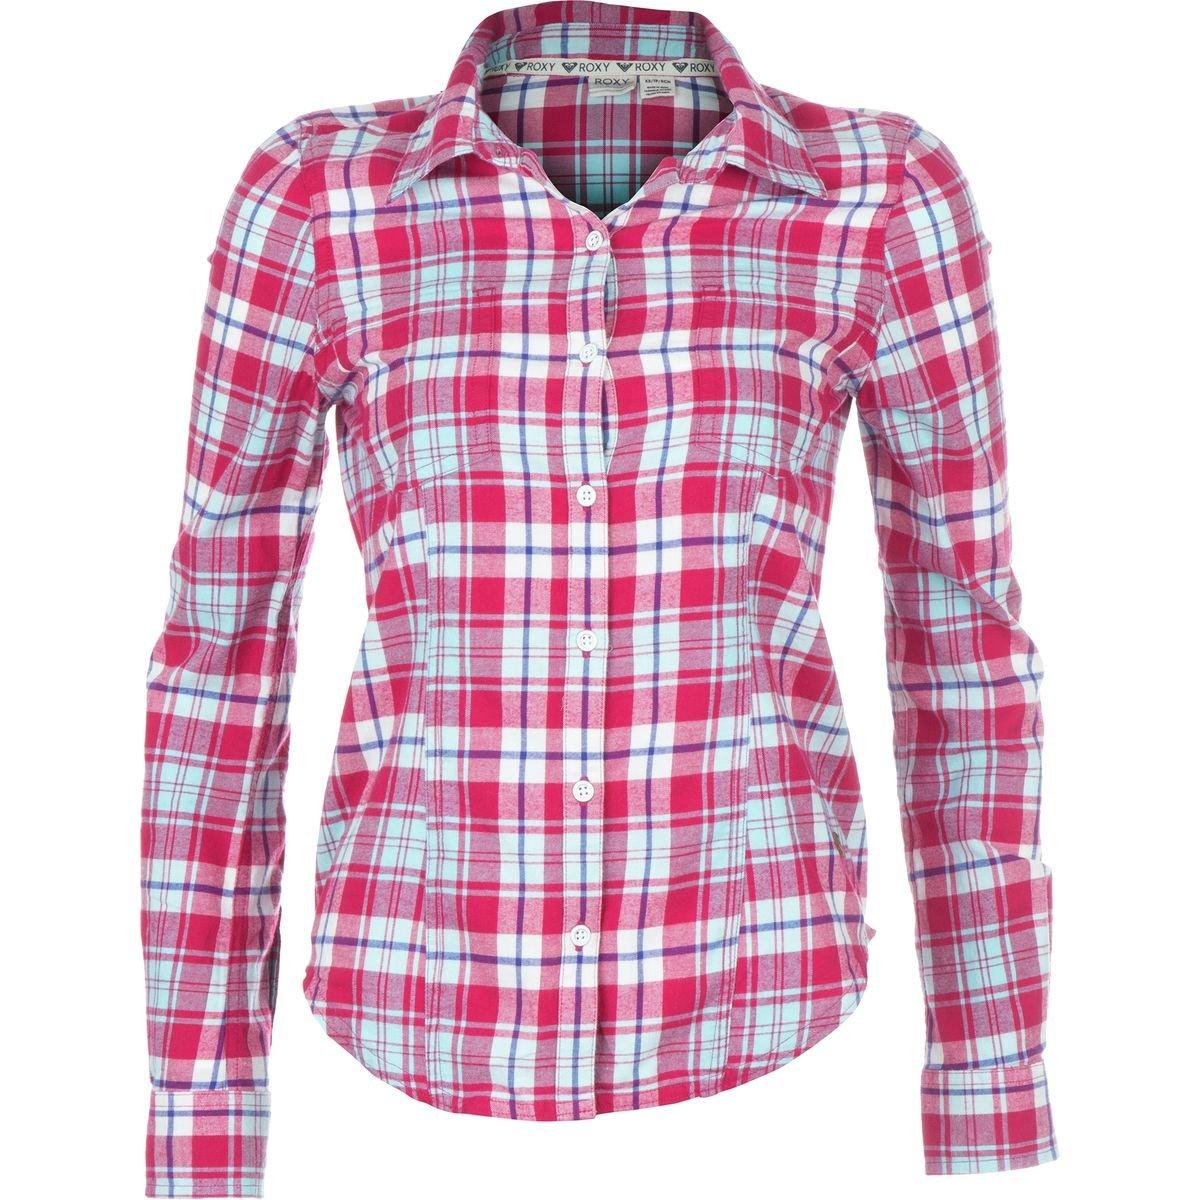 Roxy Junior's Driftwood 2 Flannel Shirt Roxy Juniors Sportswear ARJWT03094